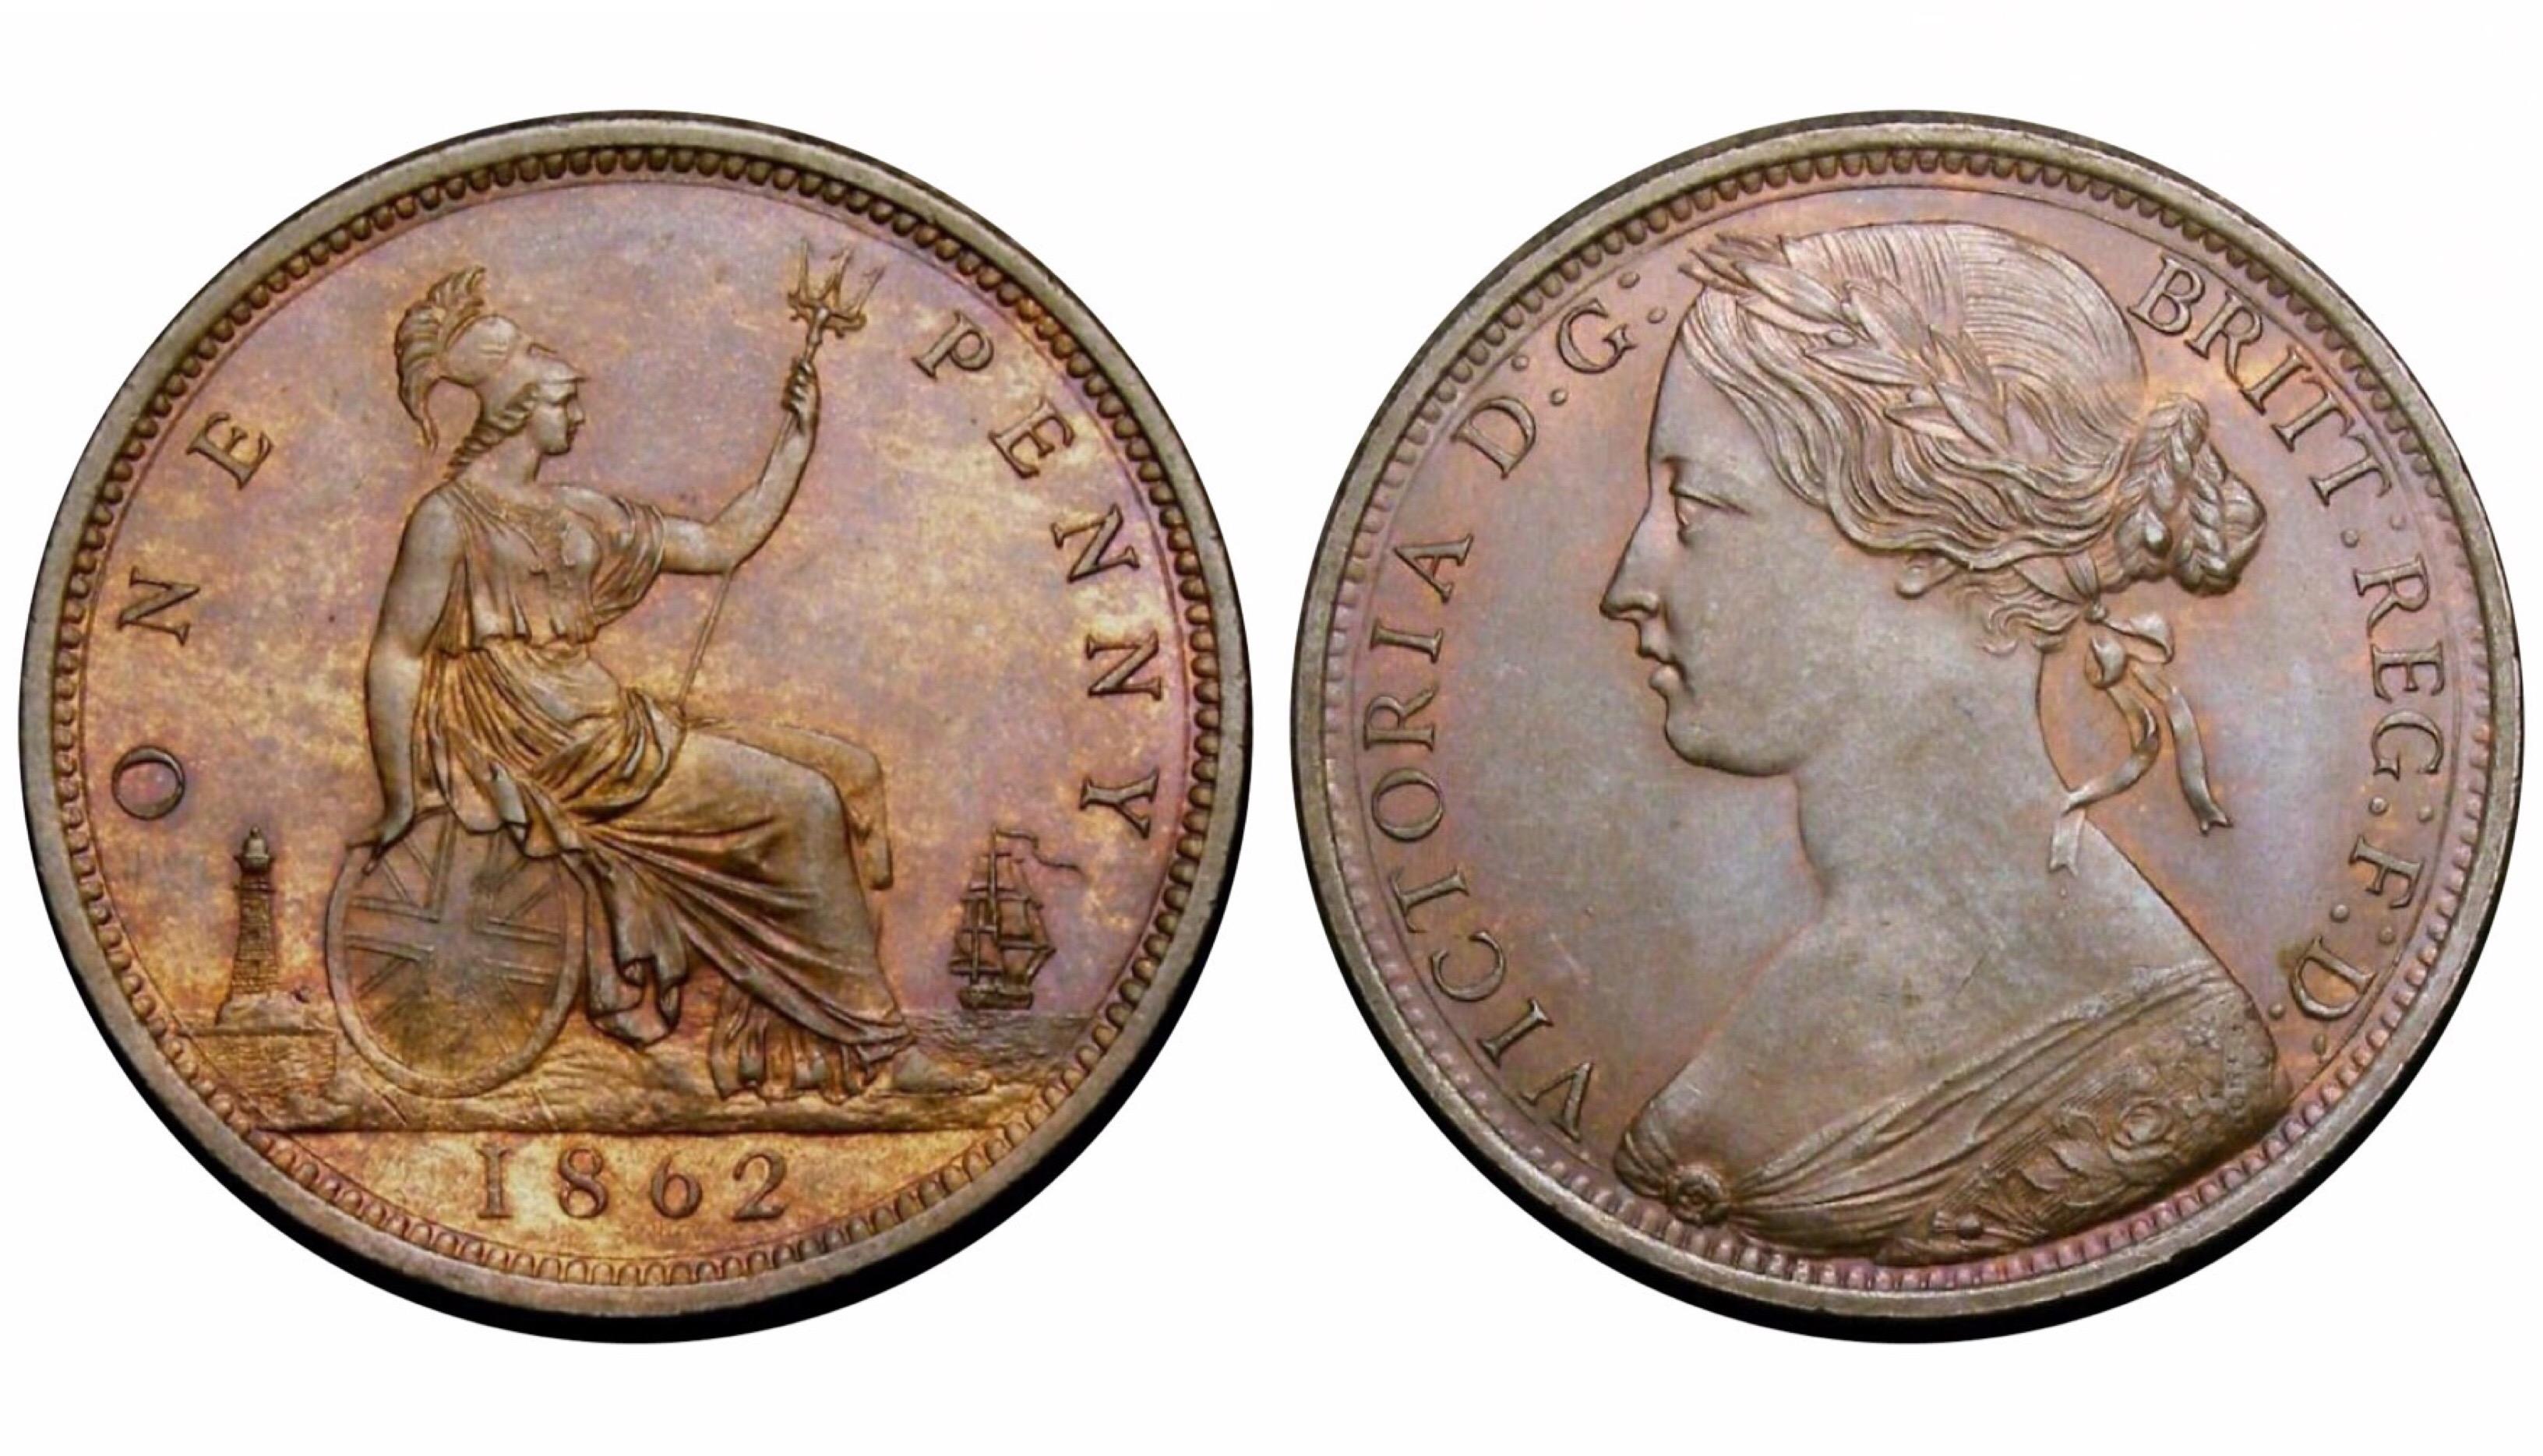 1862 Penny, UNC, CGS 78(MS 63-64), Victoria, Freeman 39, Dies 6+G, UIN 29979